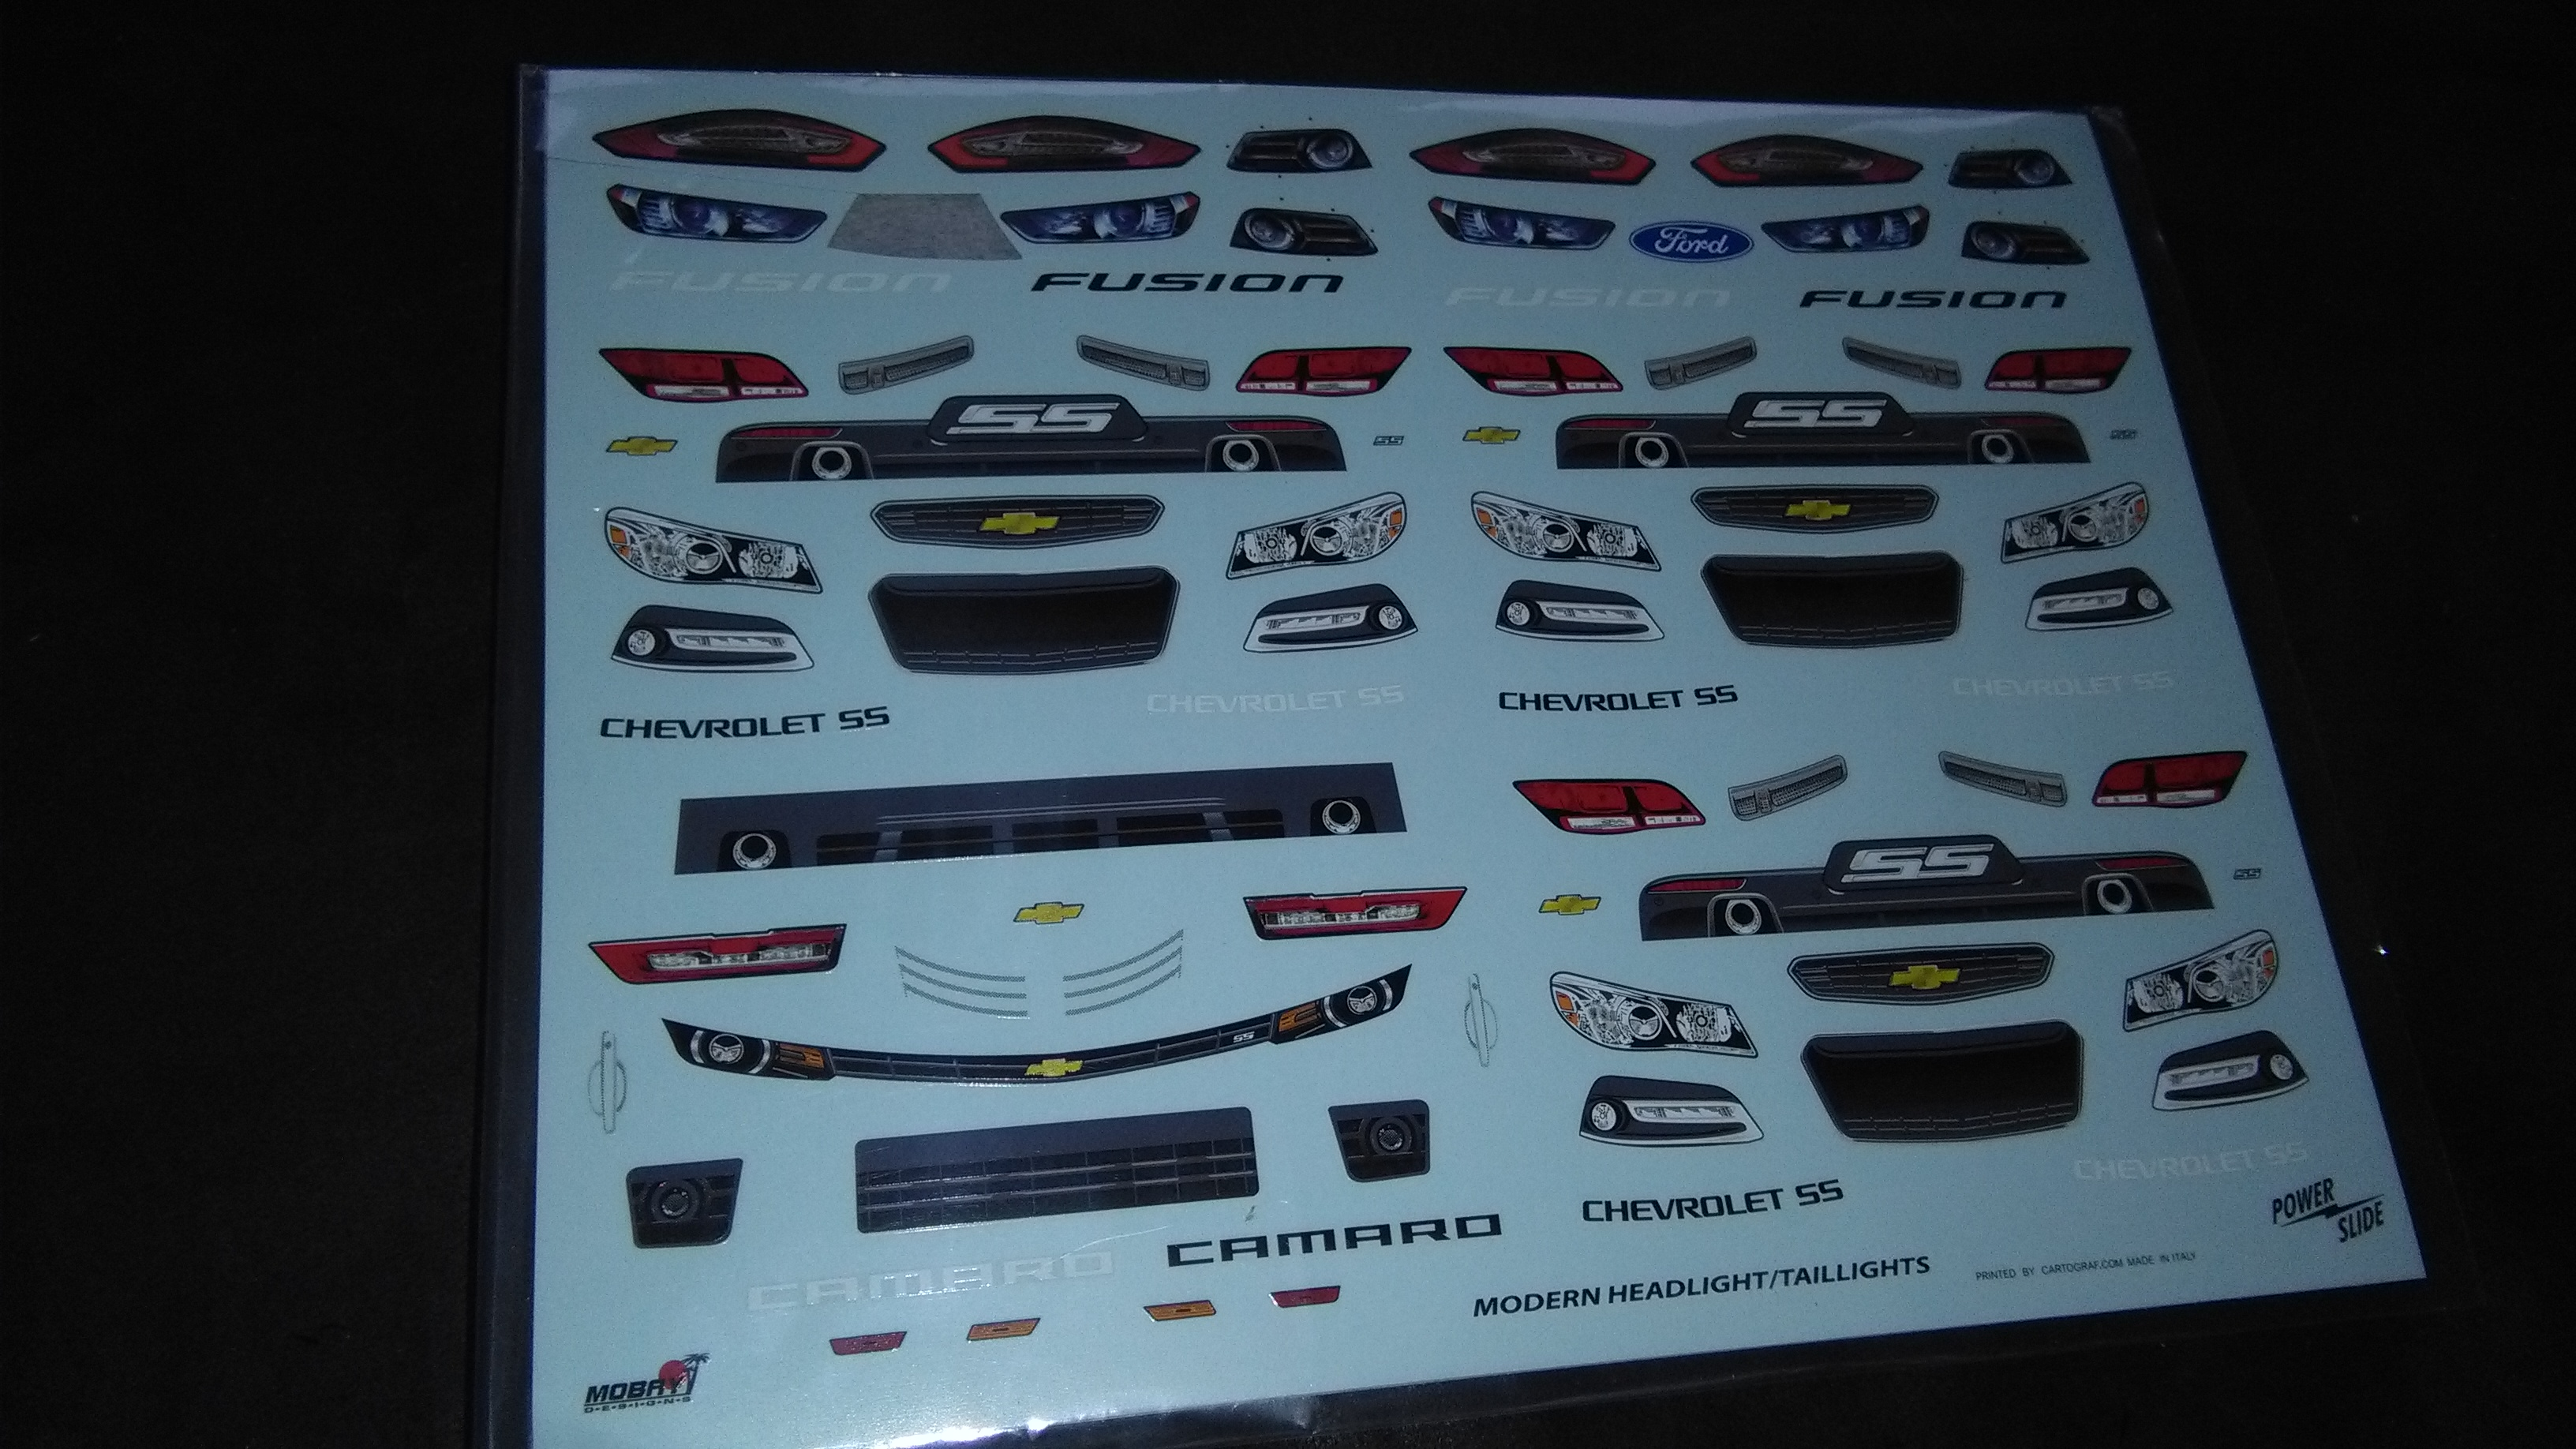 Chevrolet SS 2015 #24 Jeff Gordon 3M 219786IMG20170319173054